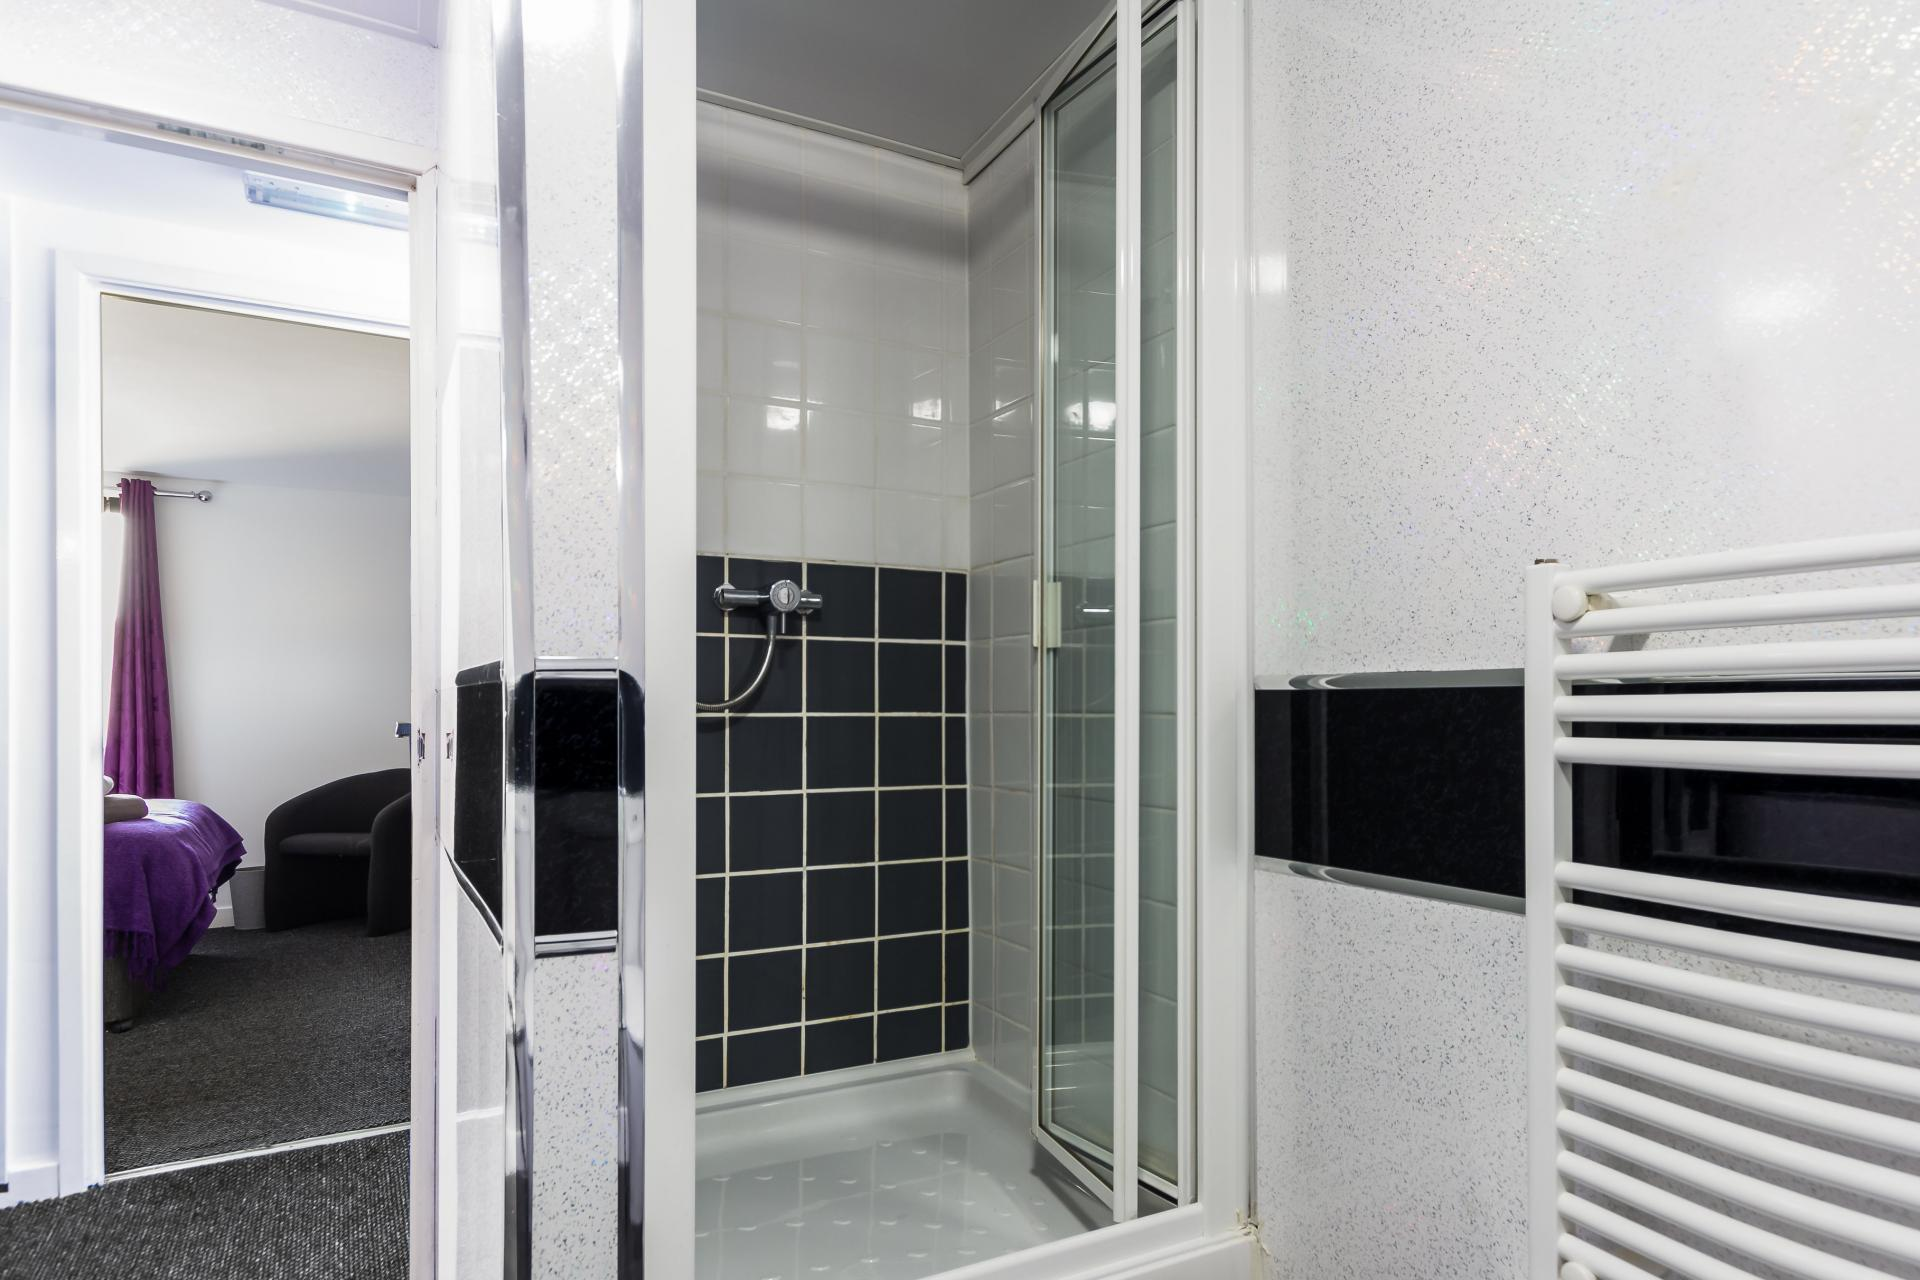 Shower at Suitestayzzz Apartments